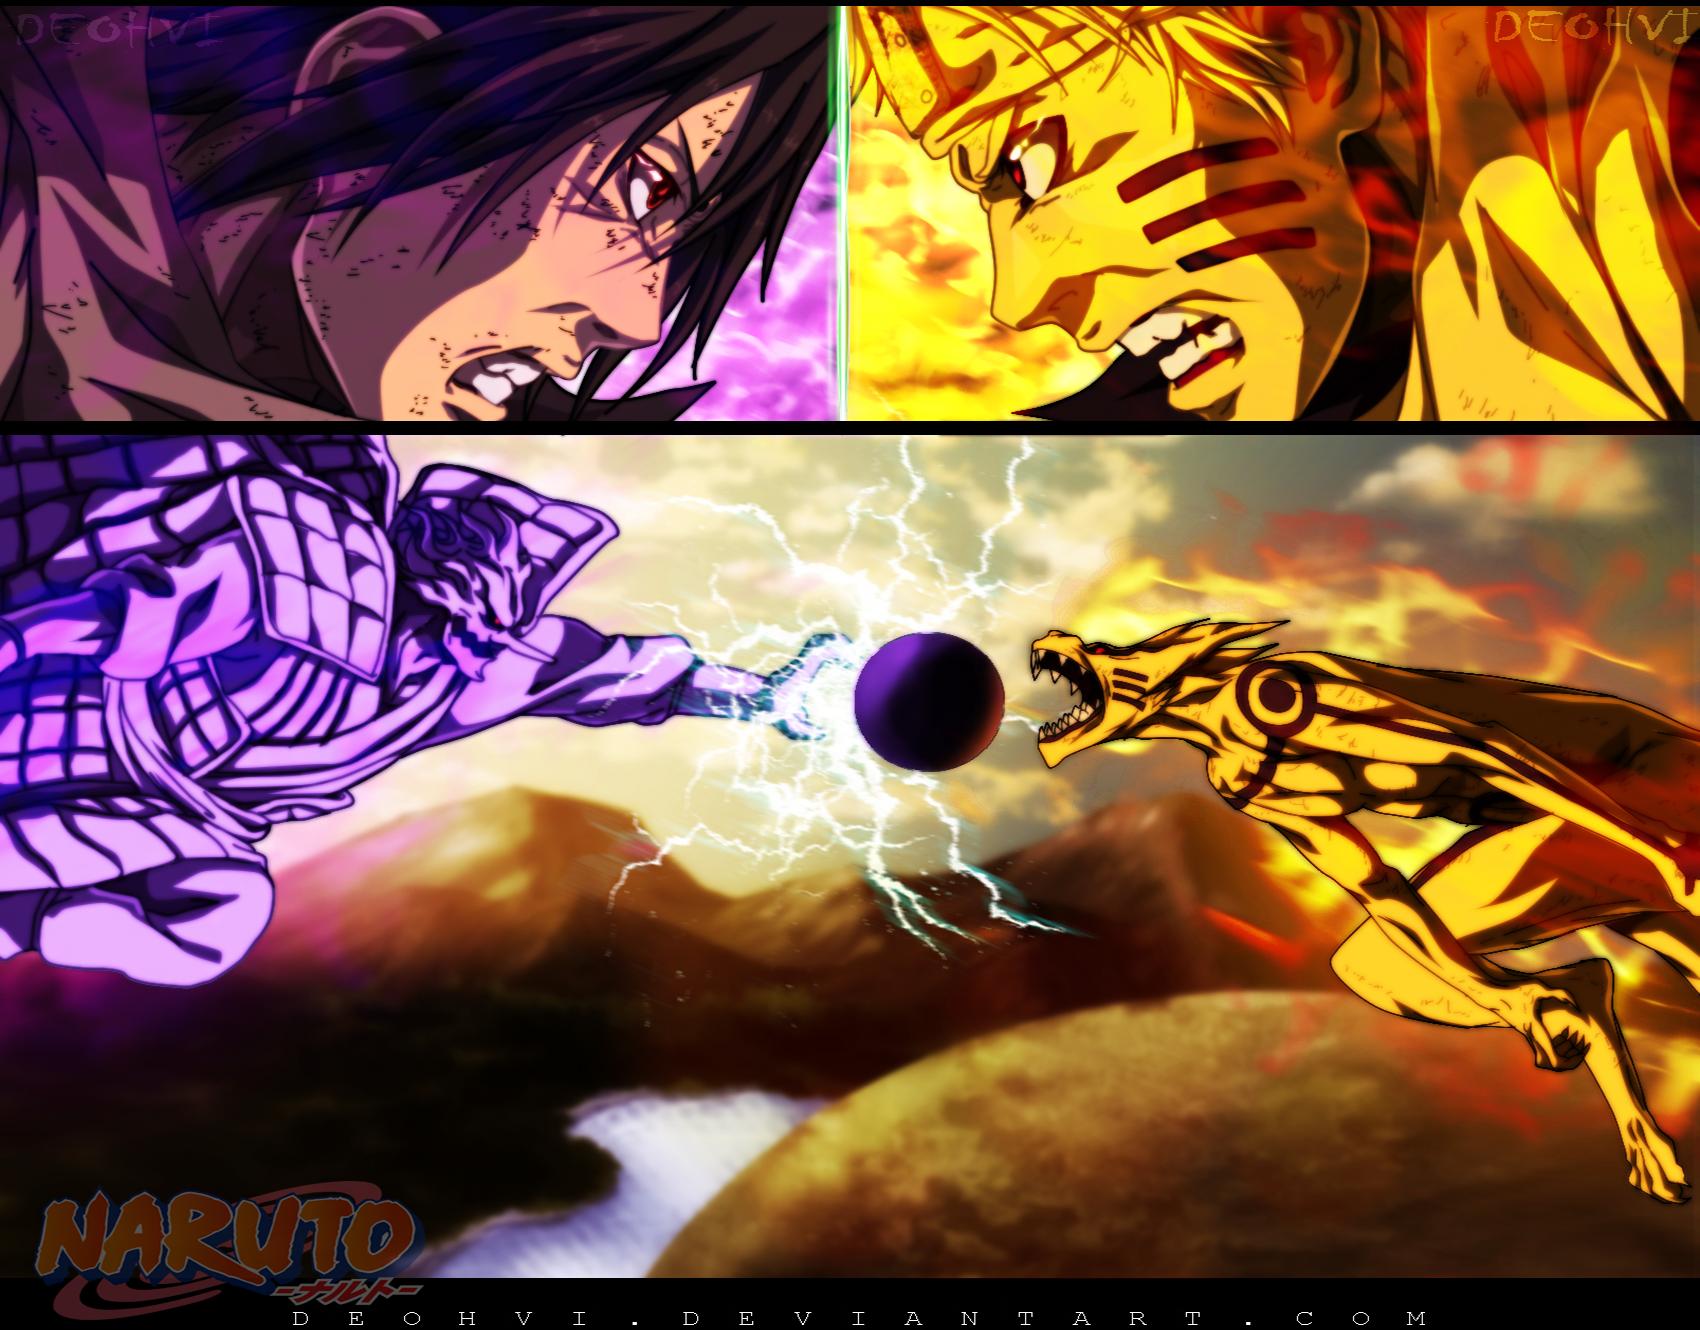 Naruto Vs Sasuke Papel de Parede and Planos de Fundo